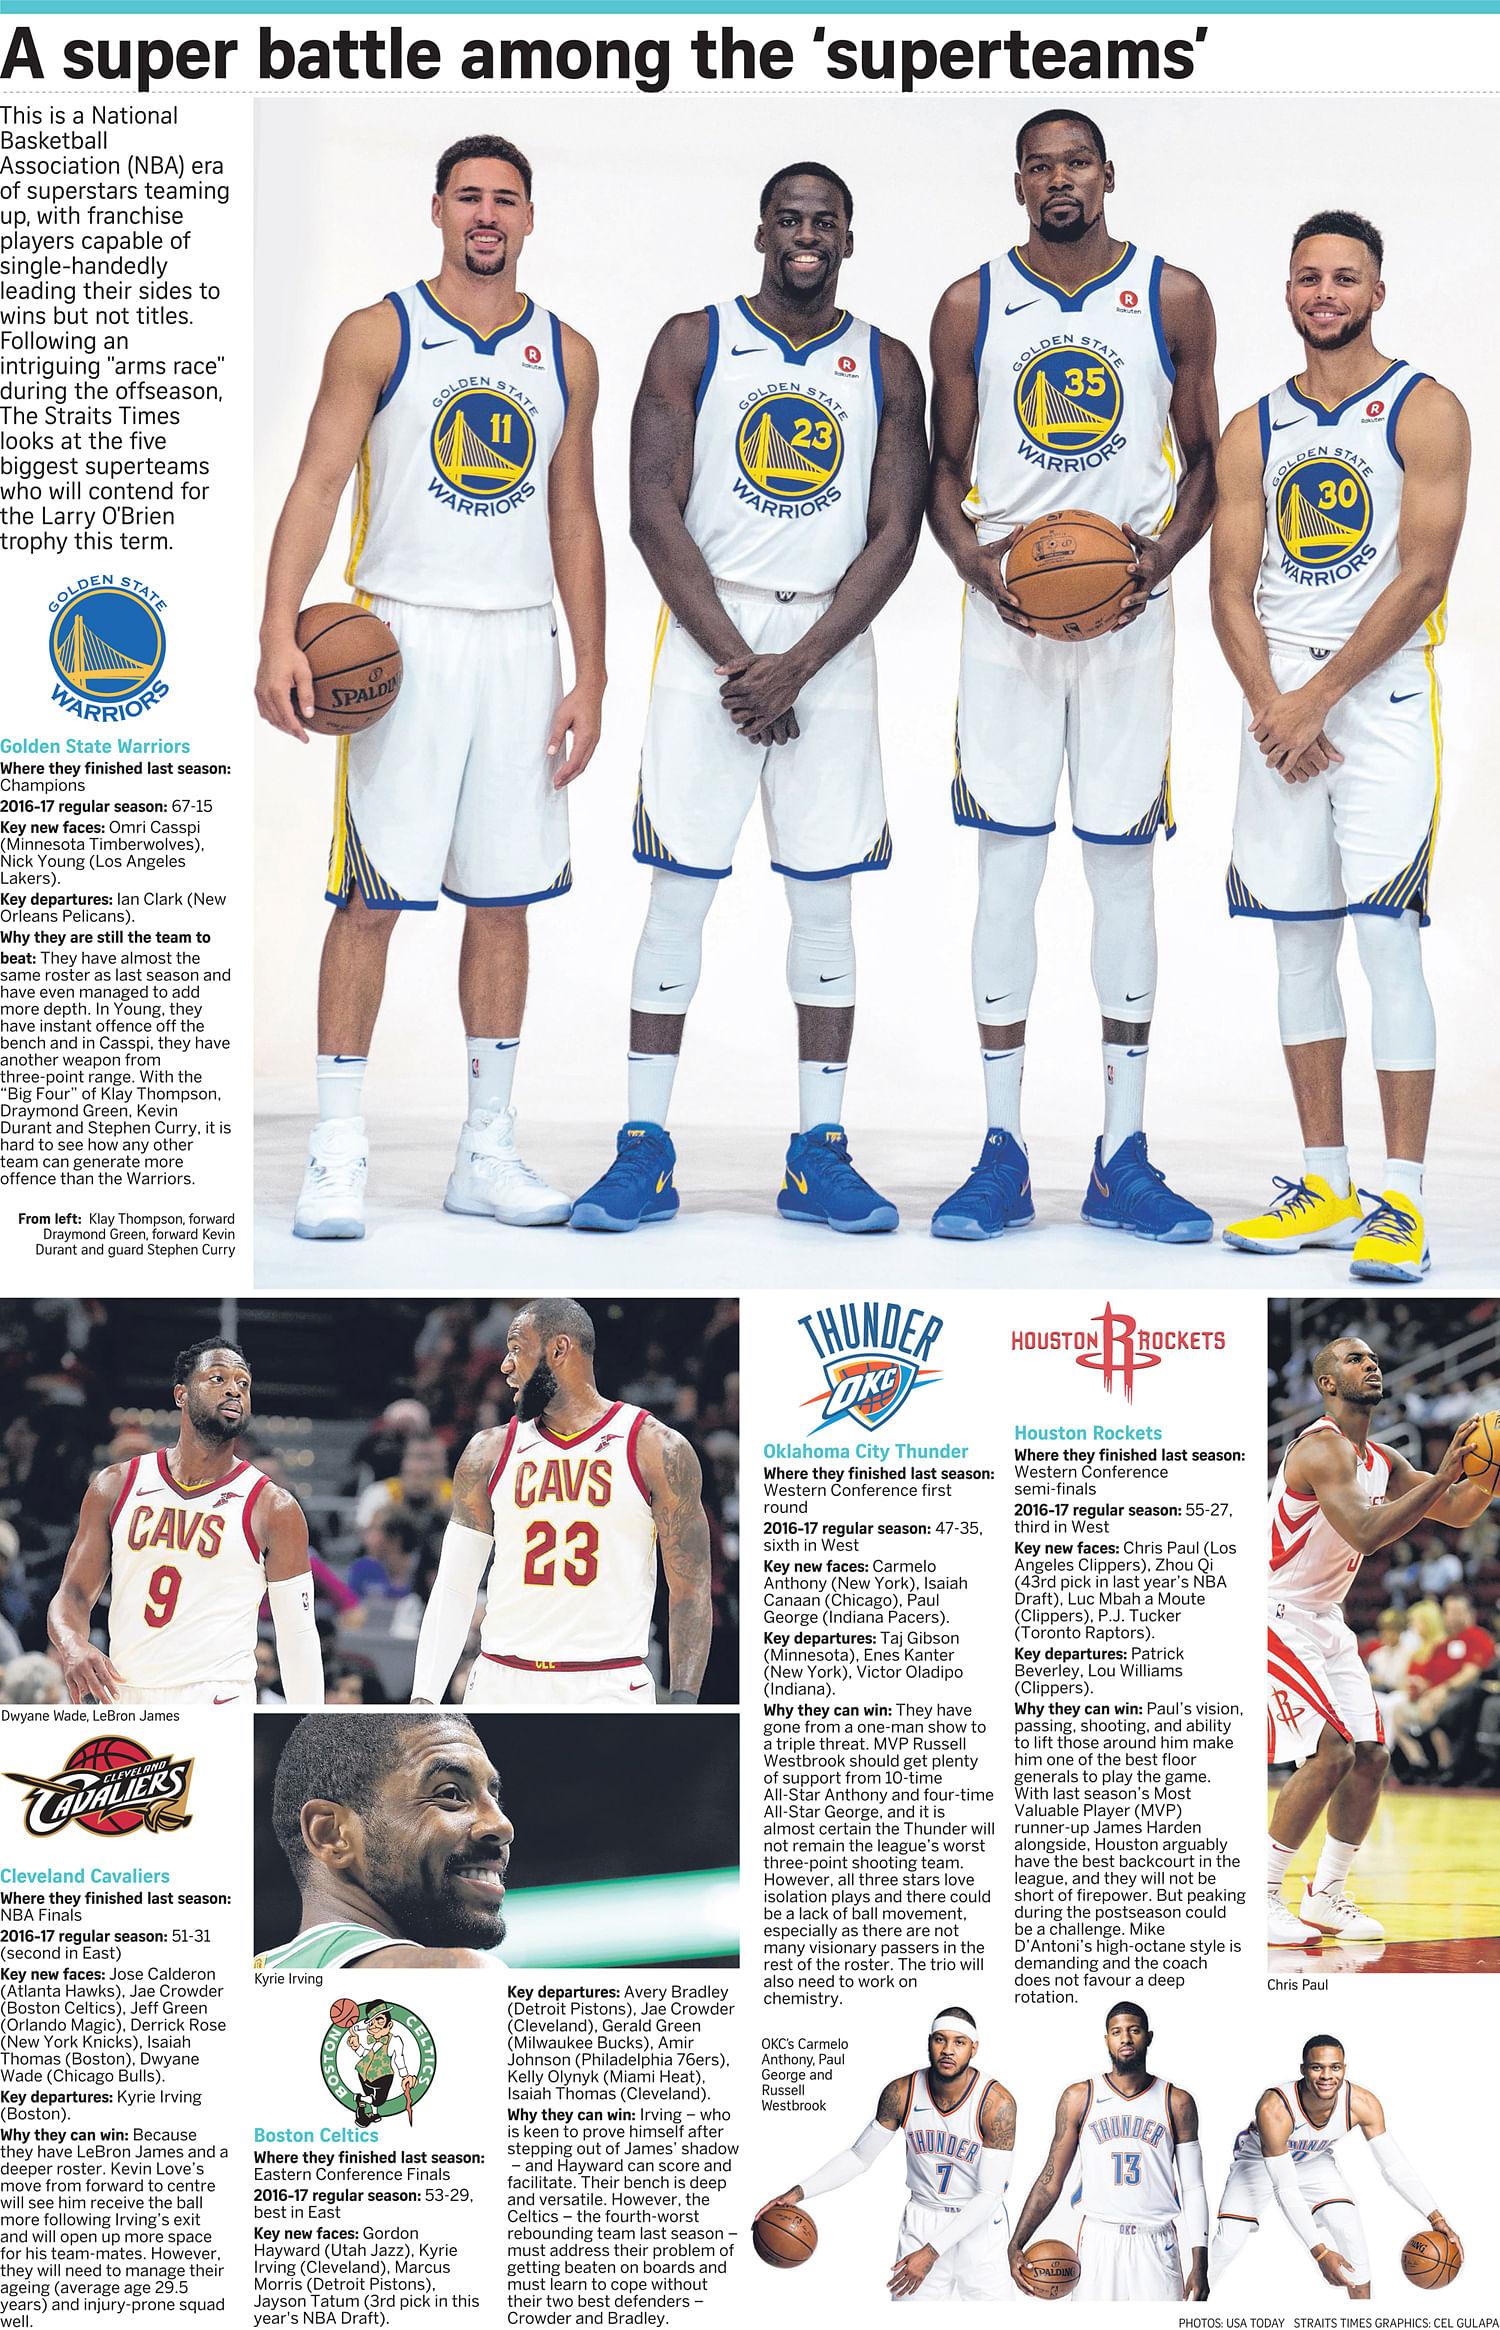 A Super Battle Among The Superteams Basketball News Top Stories